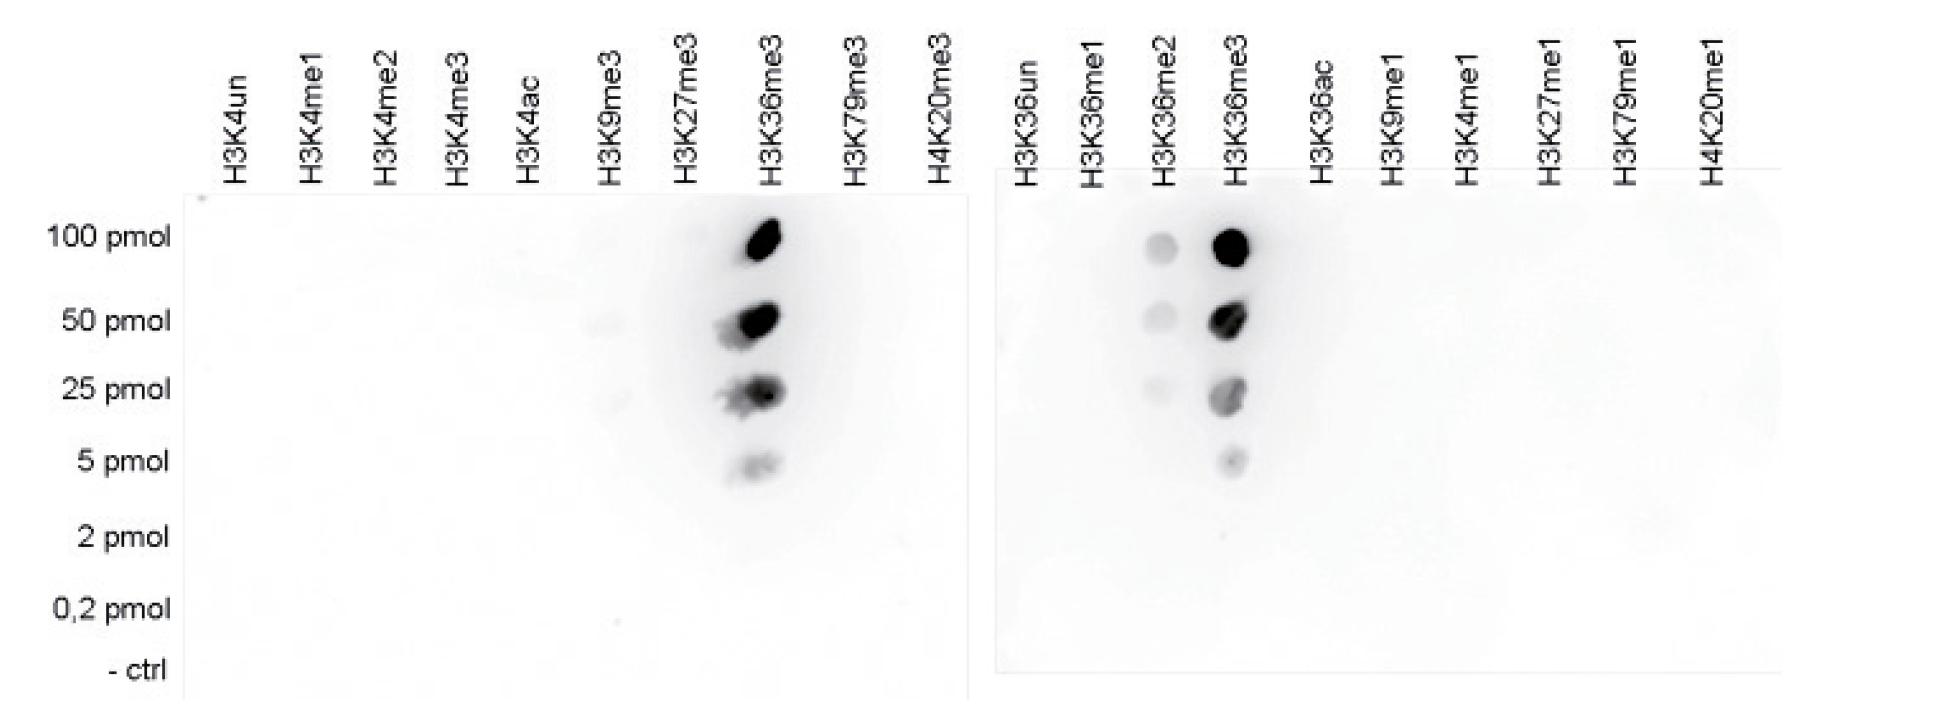 H3K36me3 Antibody Dot Blot Validation